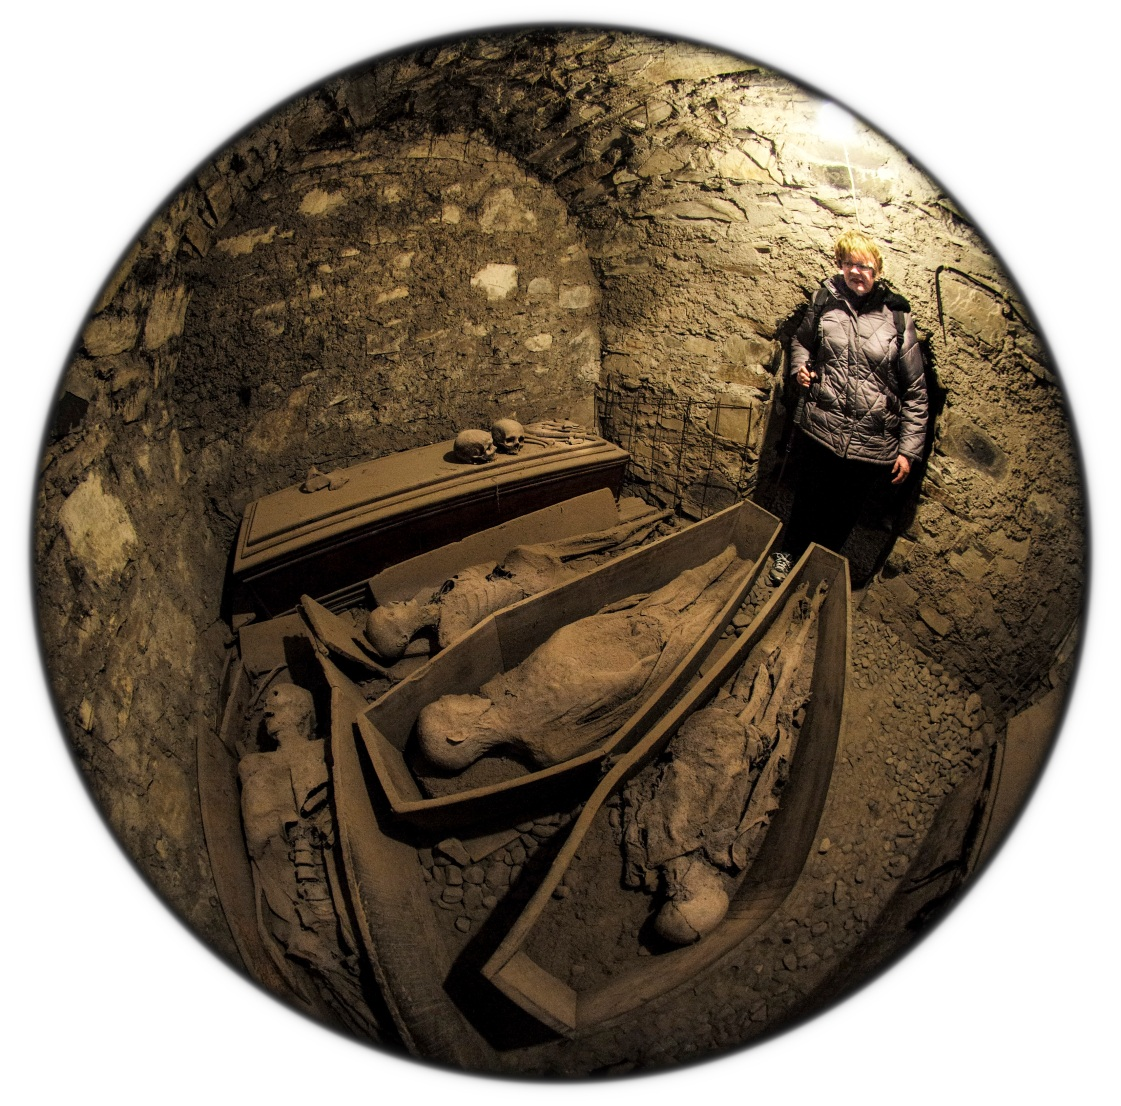 Crypt St. Michan's copyright 2015 Daniel D. Teoli Jr. mr